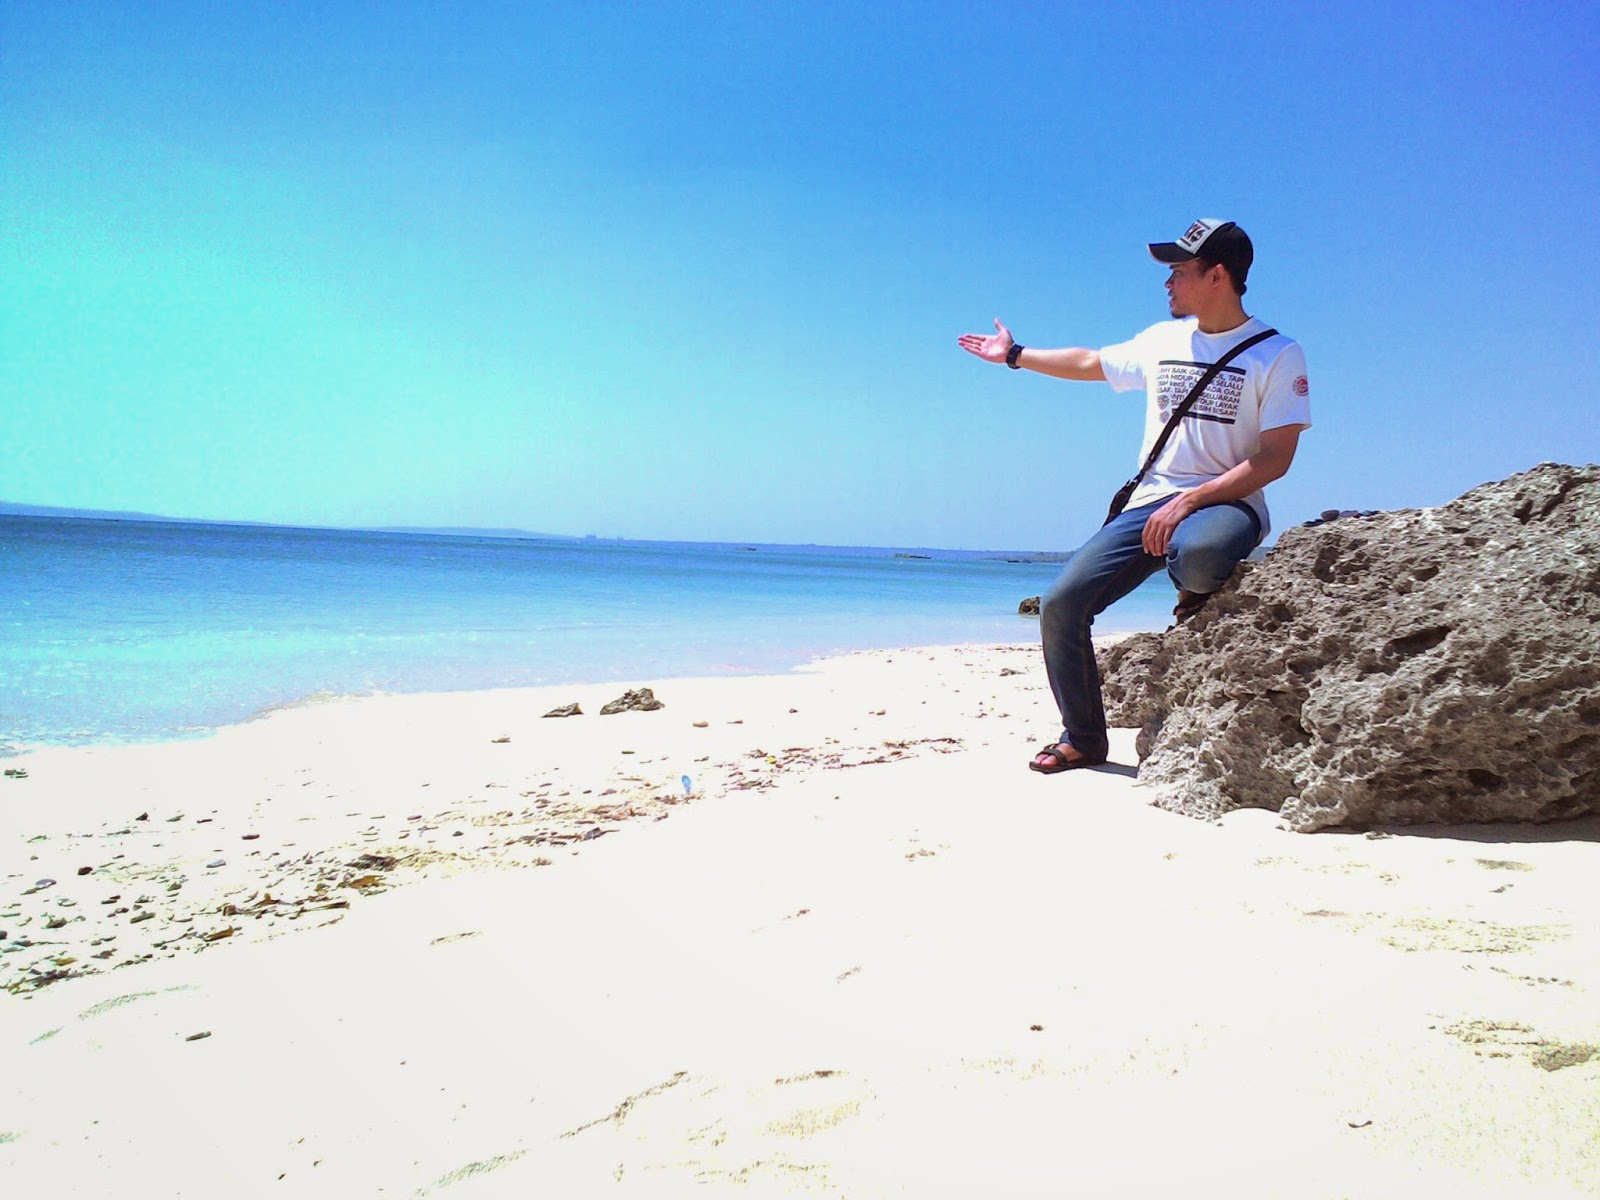 Coretan Lion Pantai Tablolong Nusa Tenggara Timur Sebelumnya Mengunjungi Lokasi